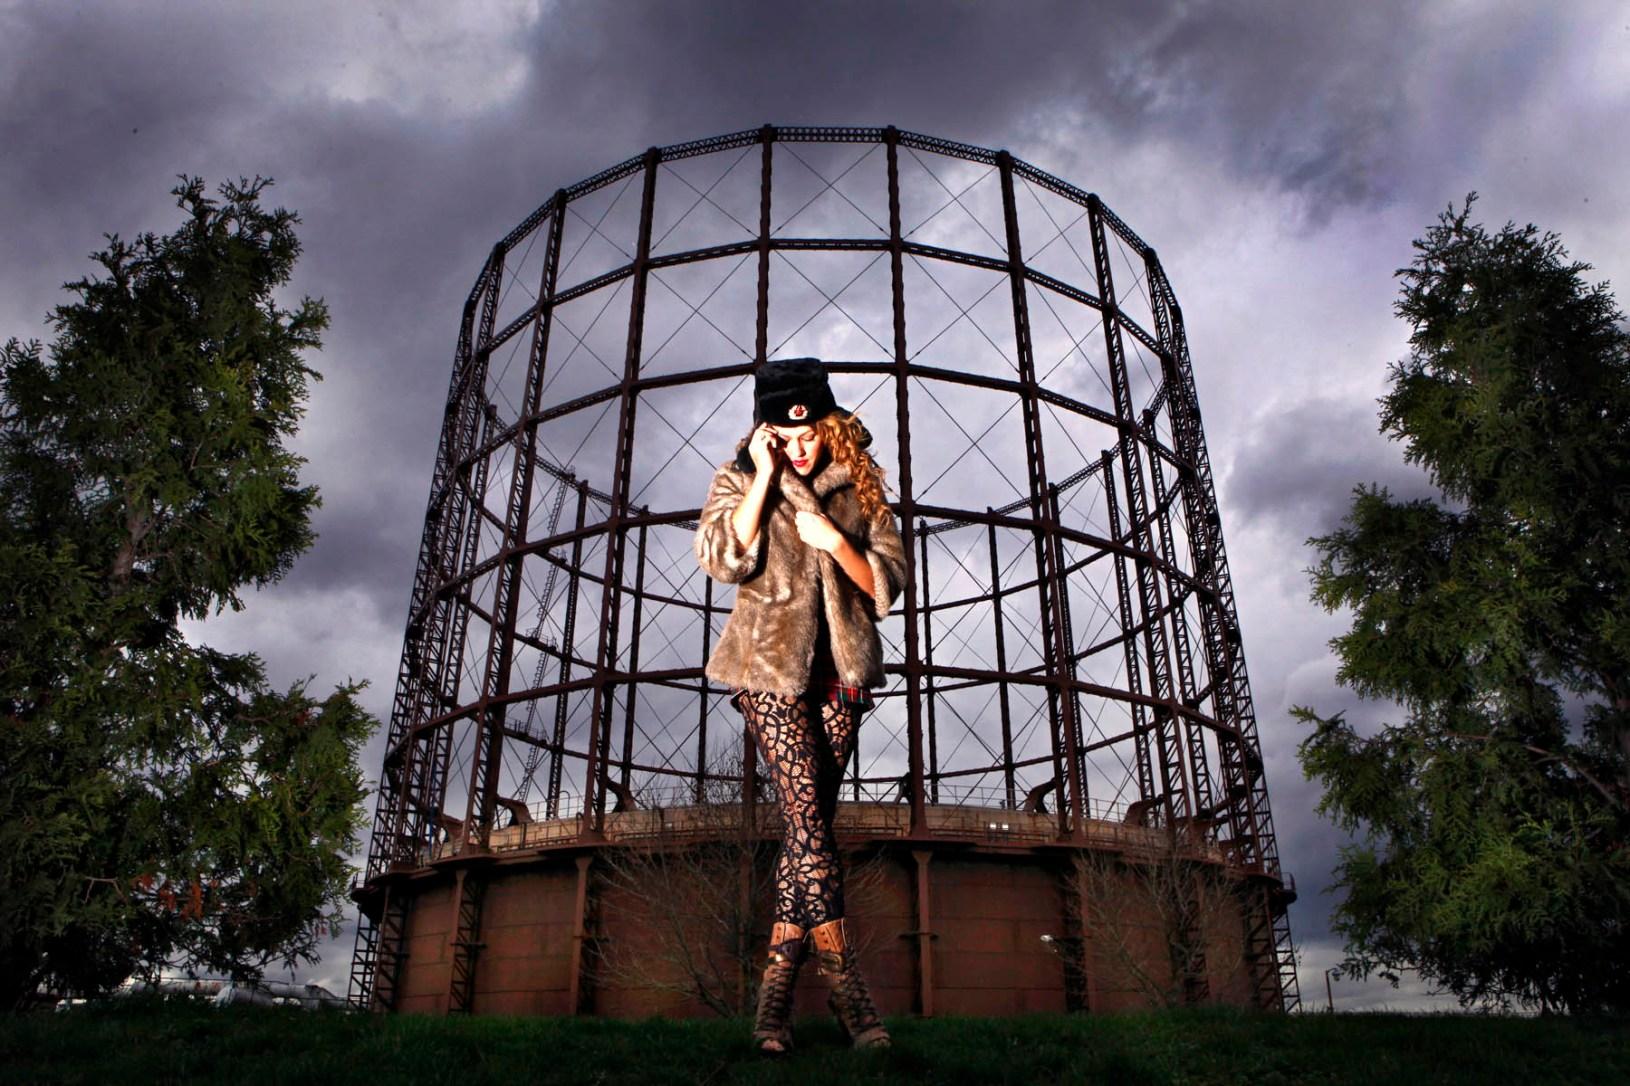 musician_artist_promo_photographer_london (12)